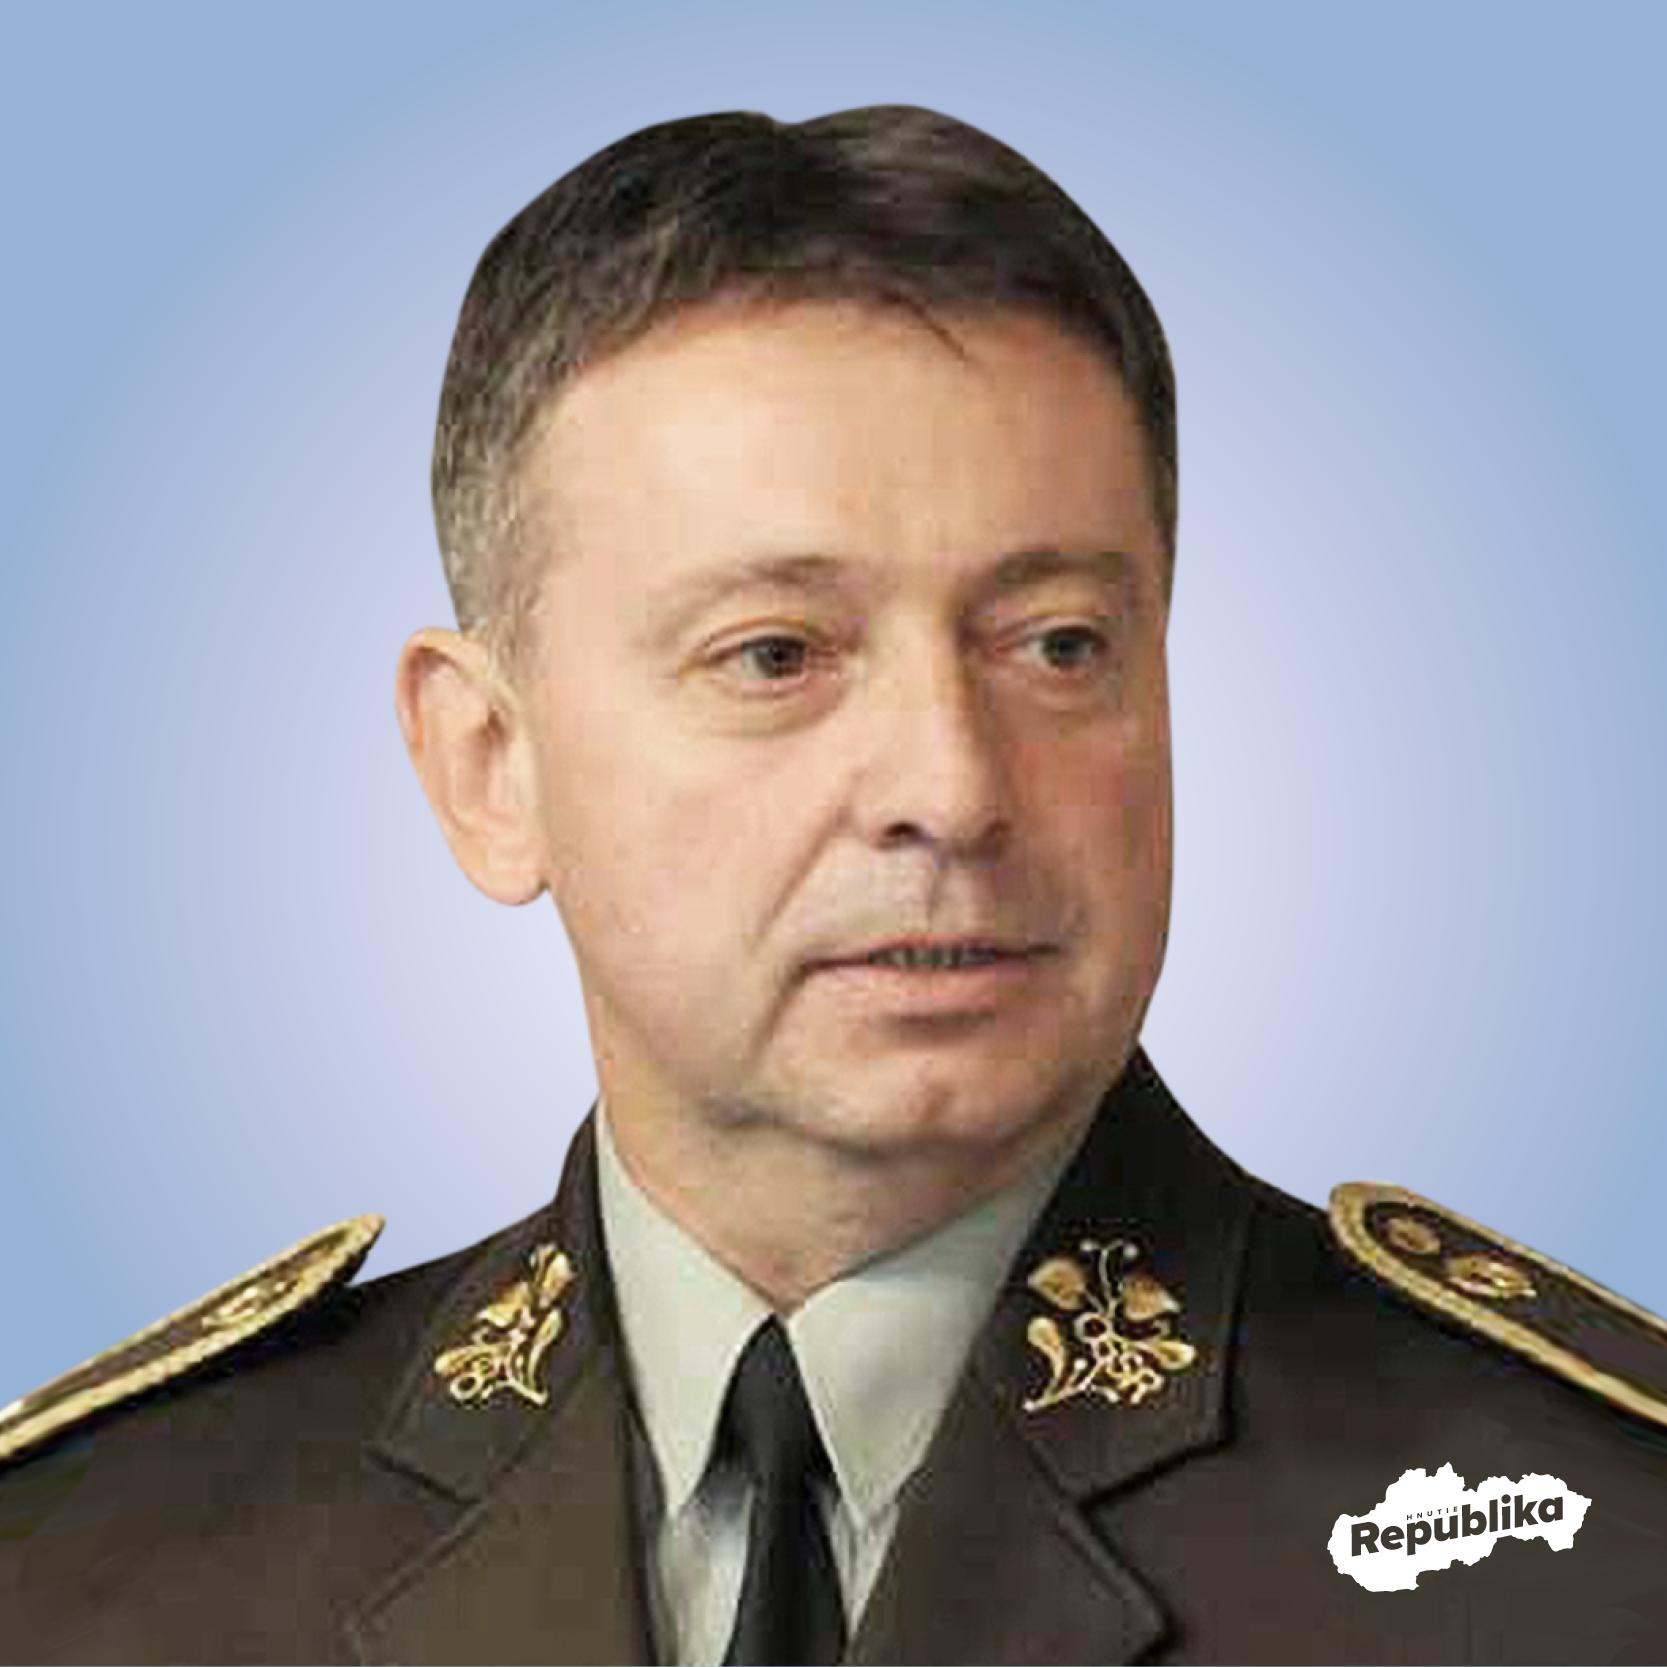 gen. PhDr. Jozef Viktorín